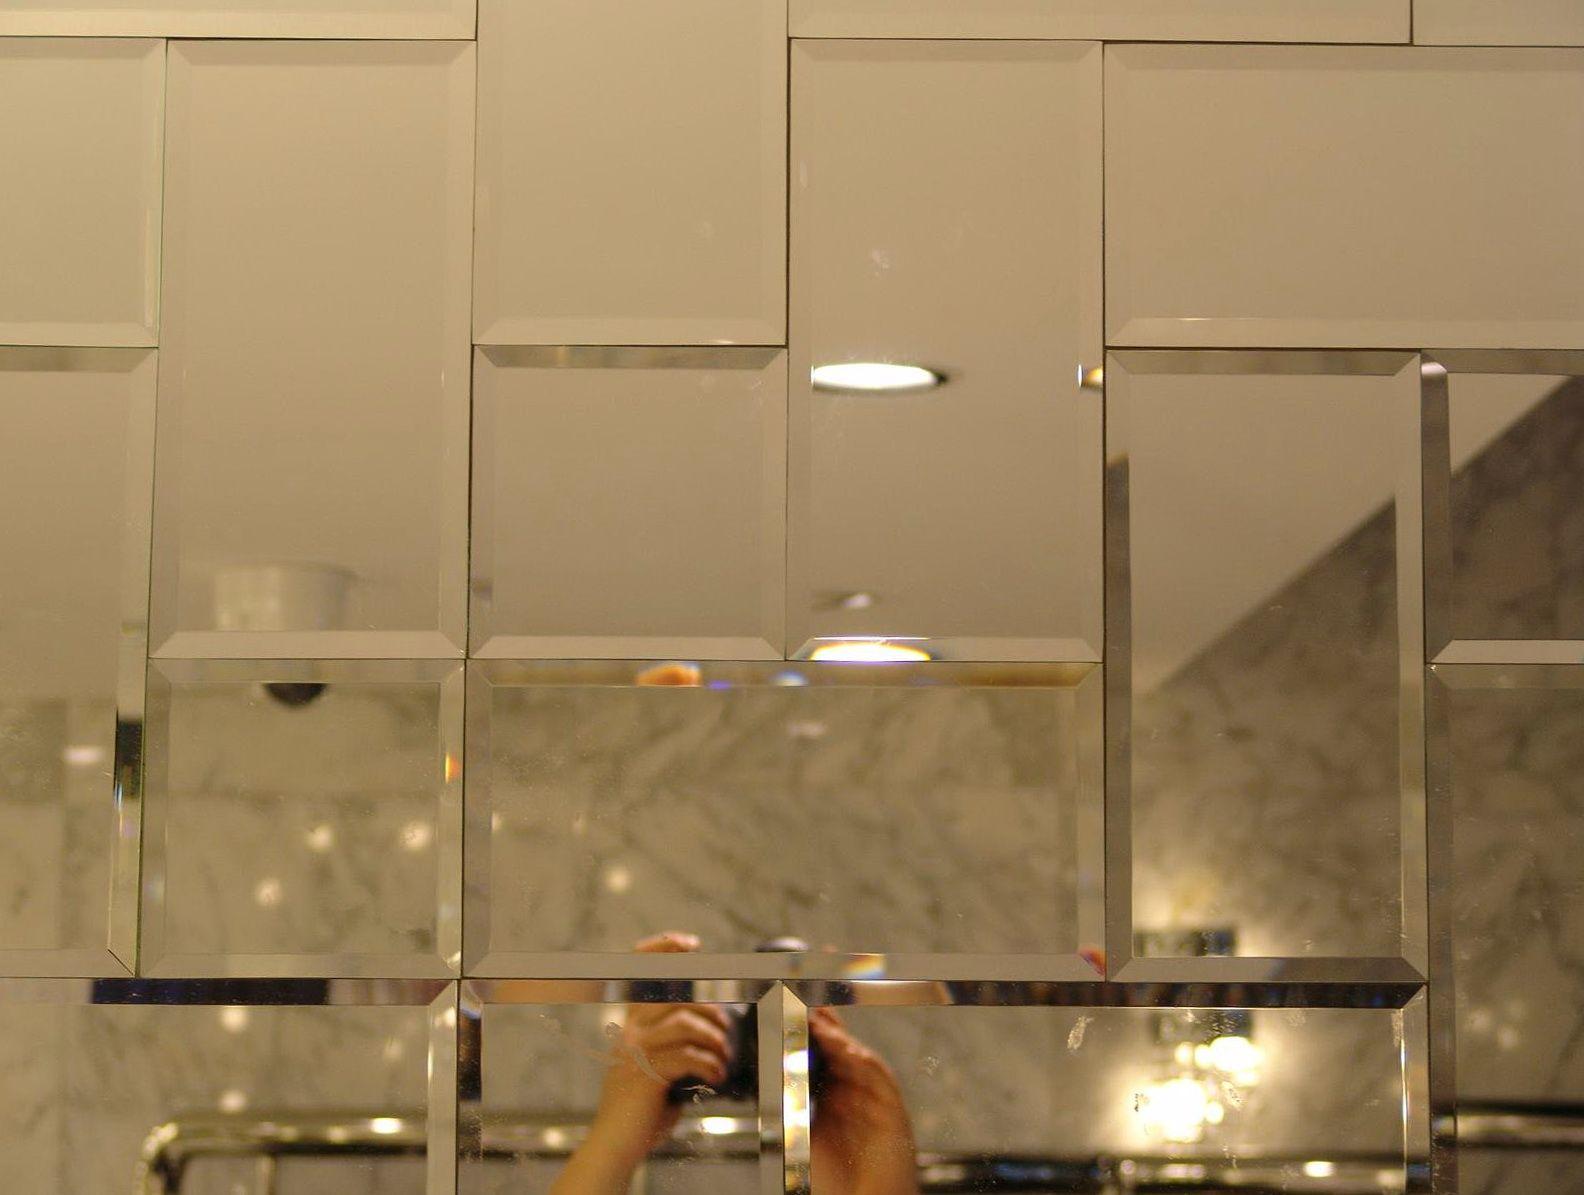 Charmant Mirror Wall Tiles Ideas